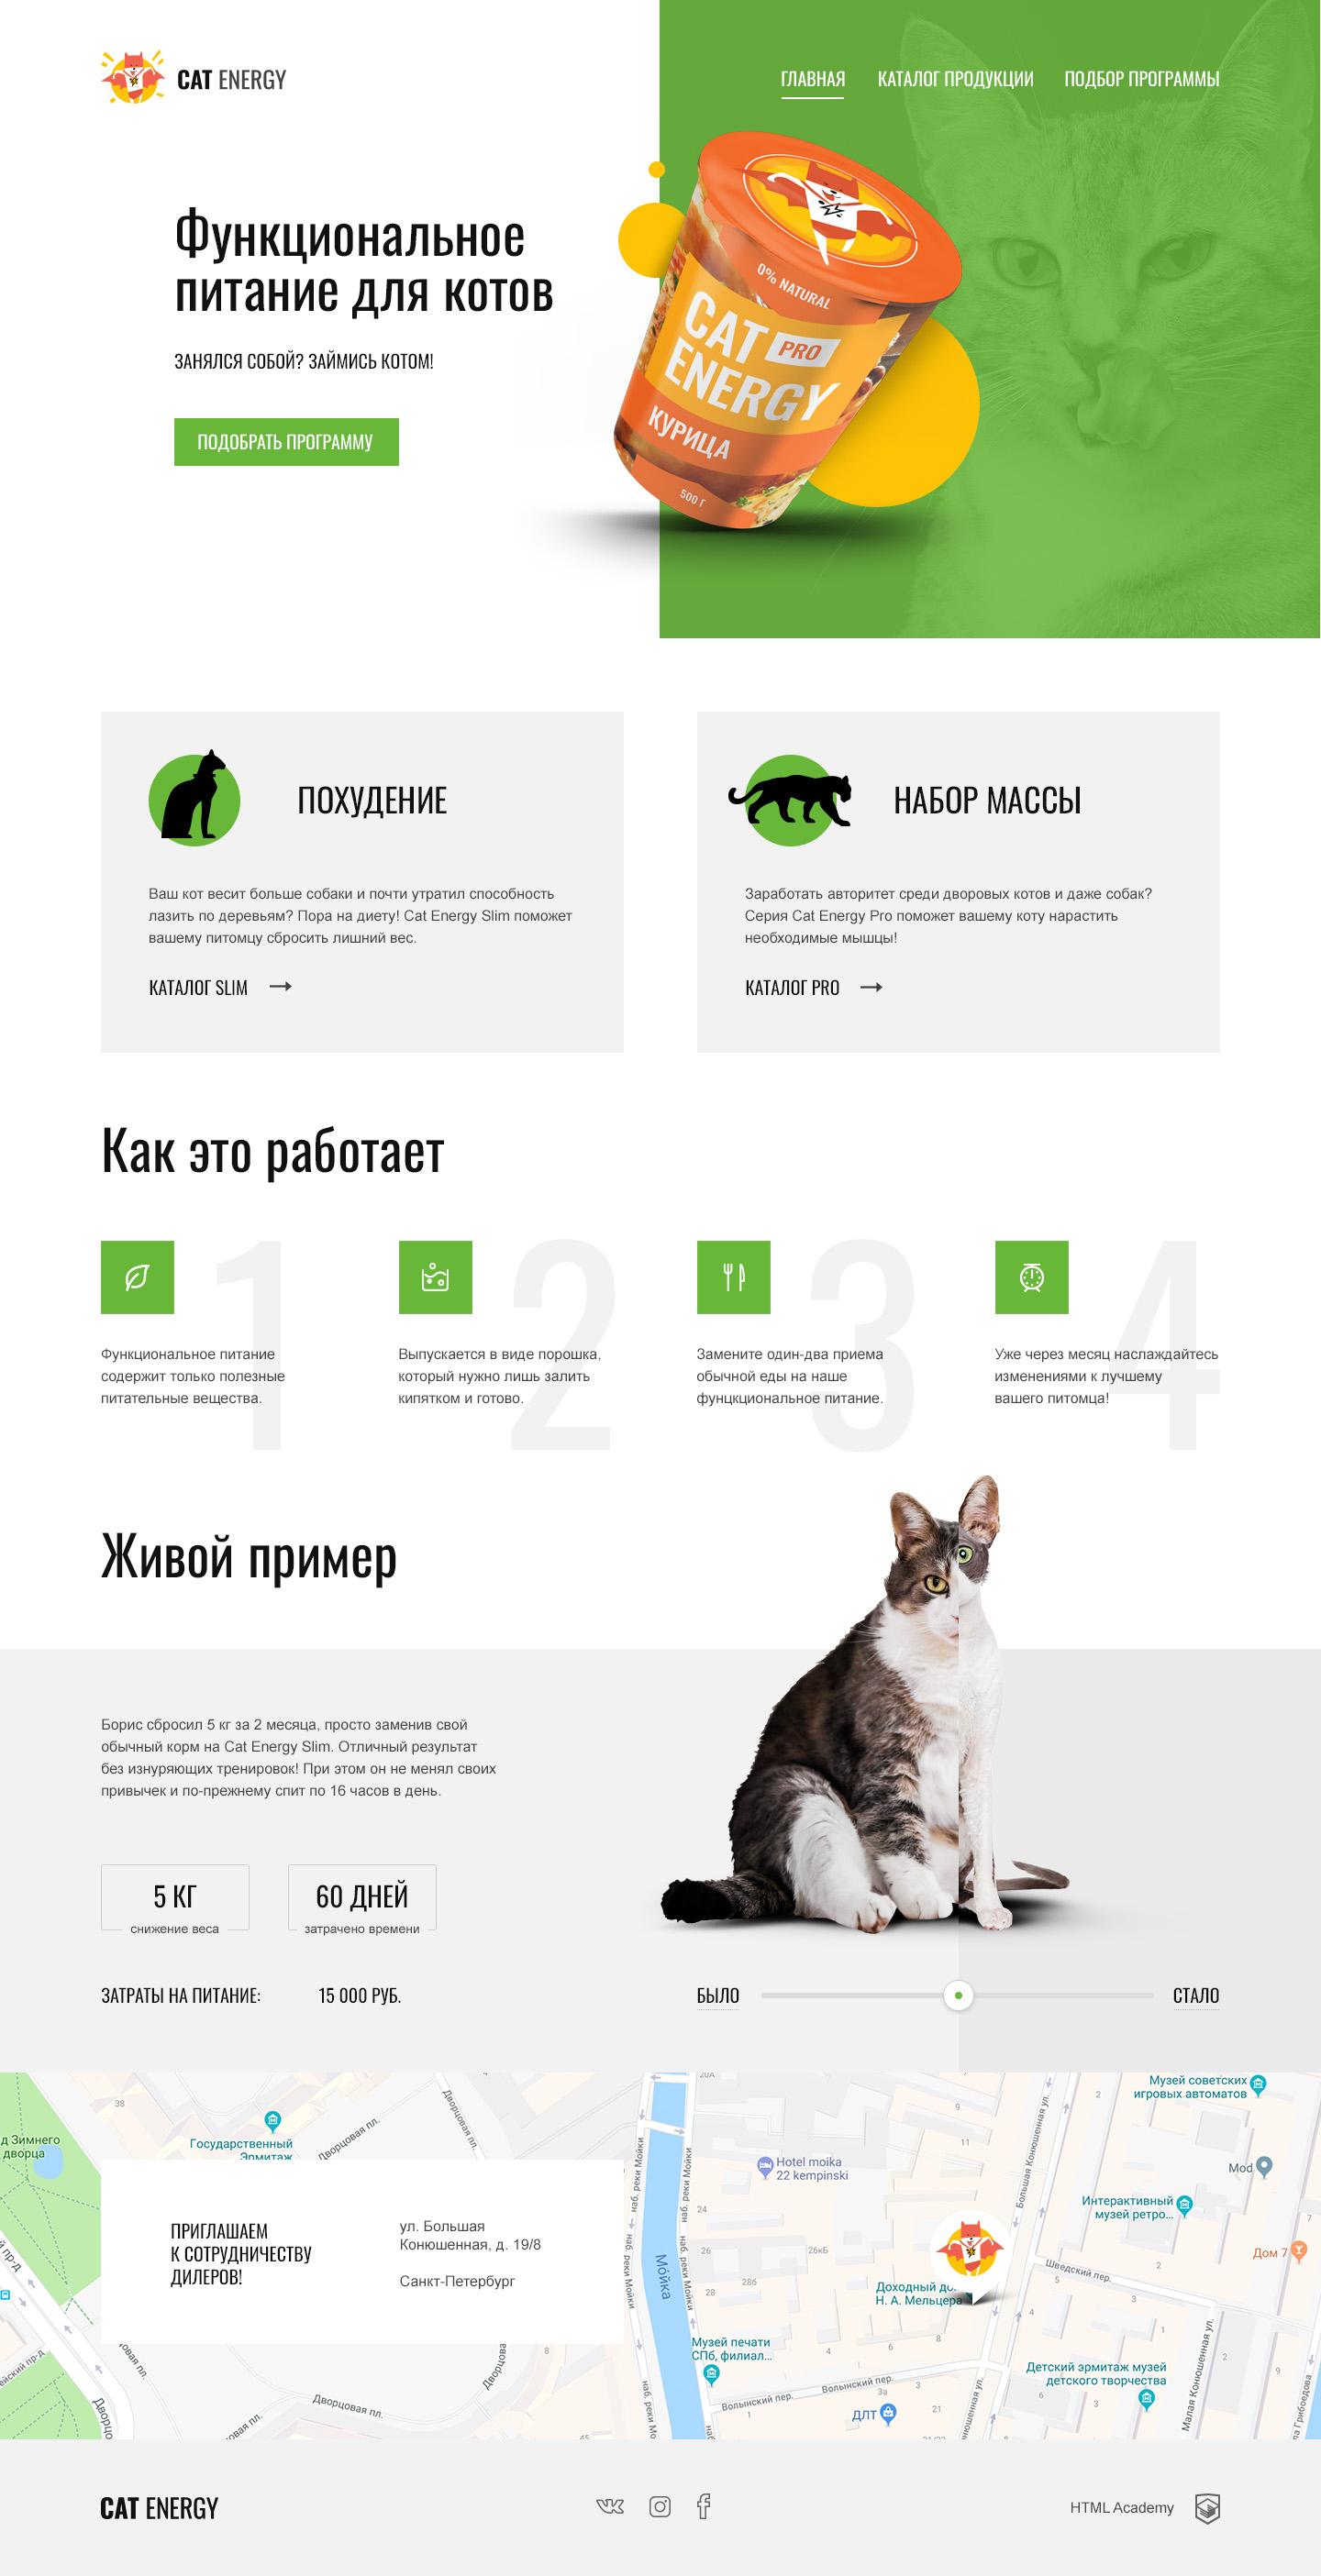 Разработка проекта Cat Energy